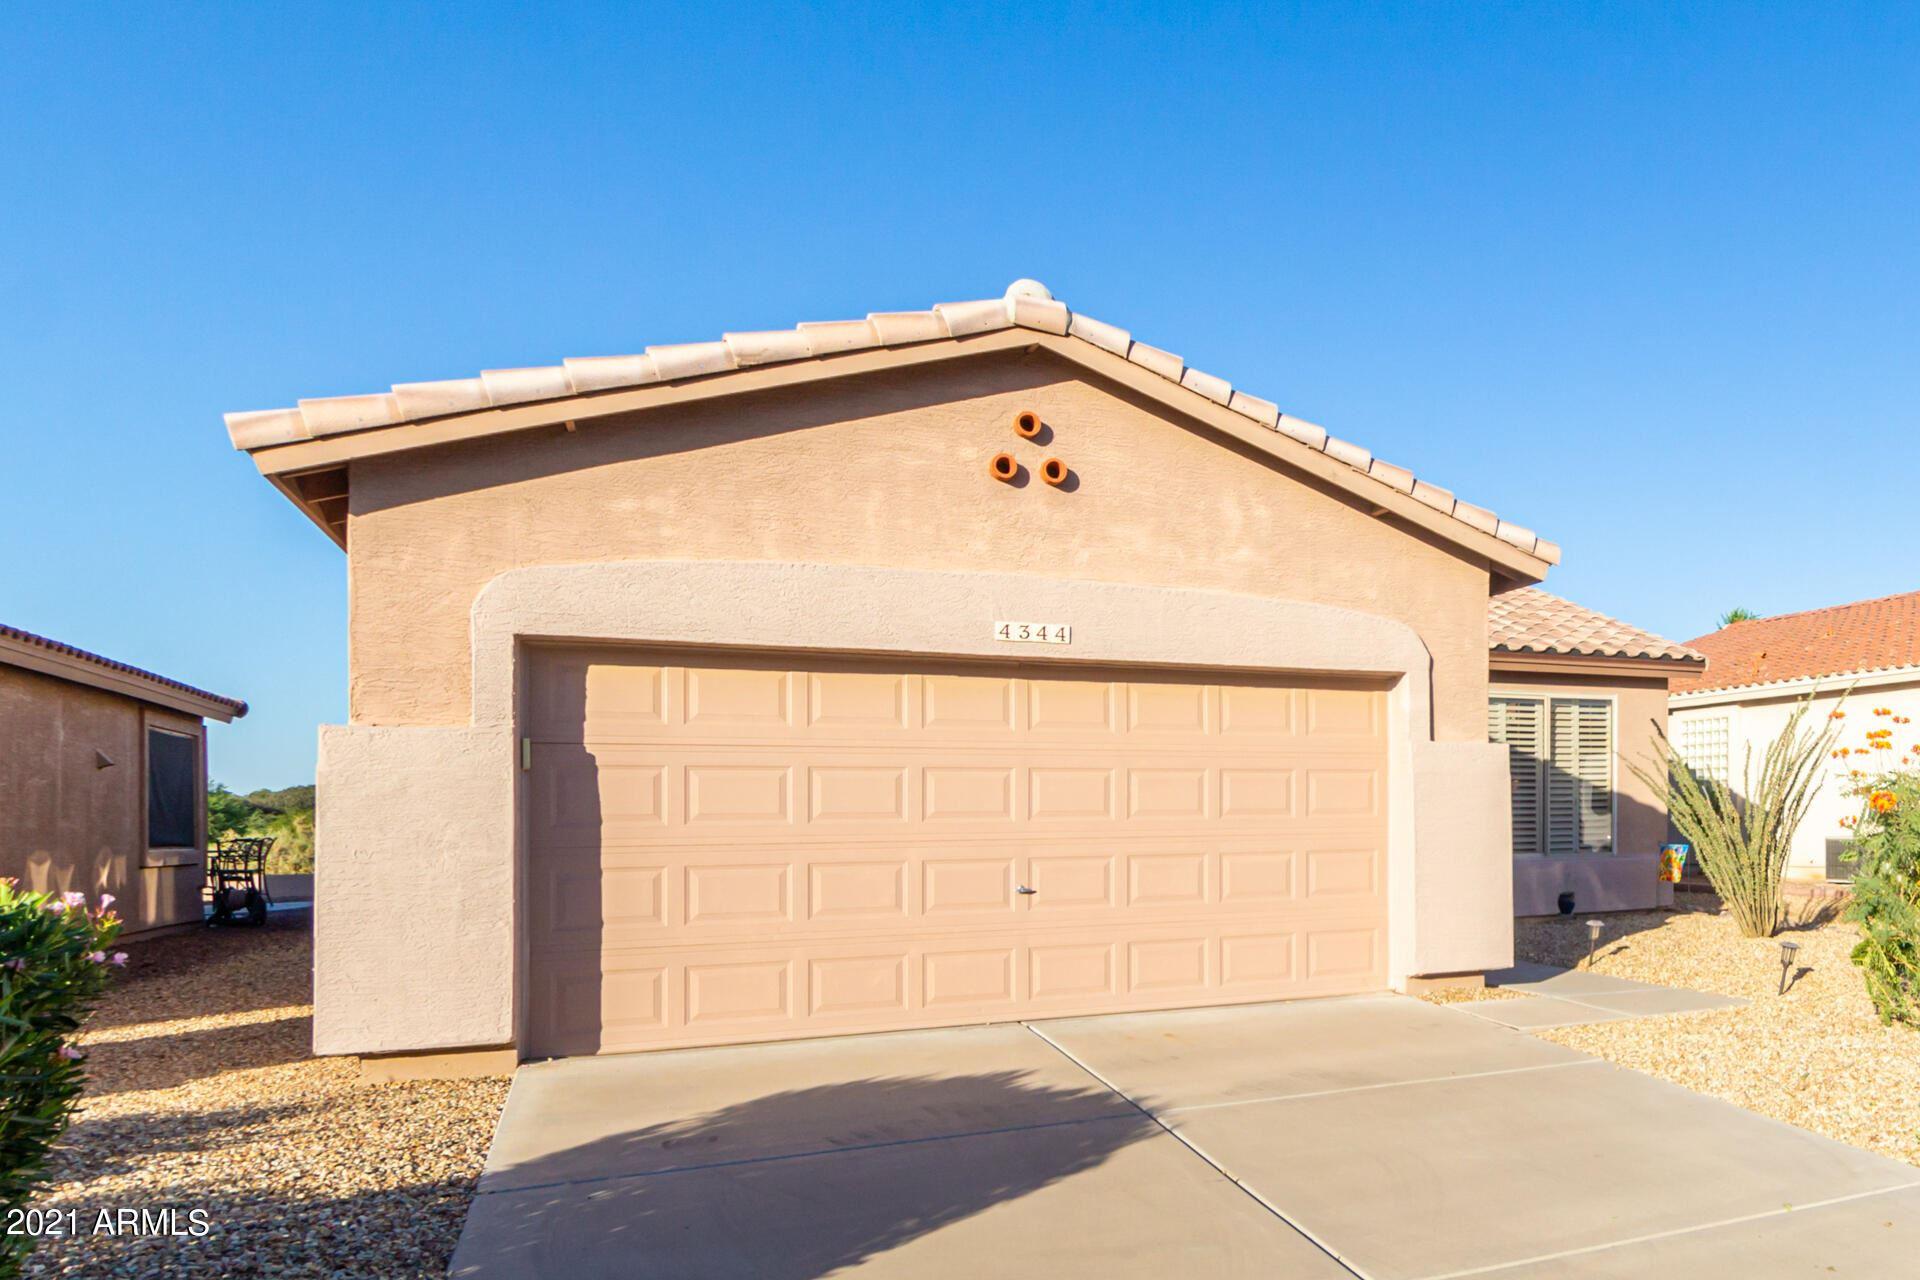 Photo of 4344 E STRAWBERRY Drive, Gilbert, AZ 85298 (MLS # 6307612)